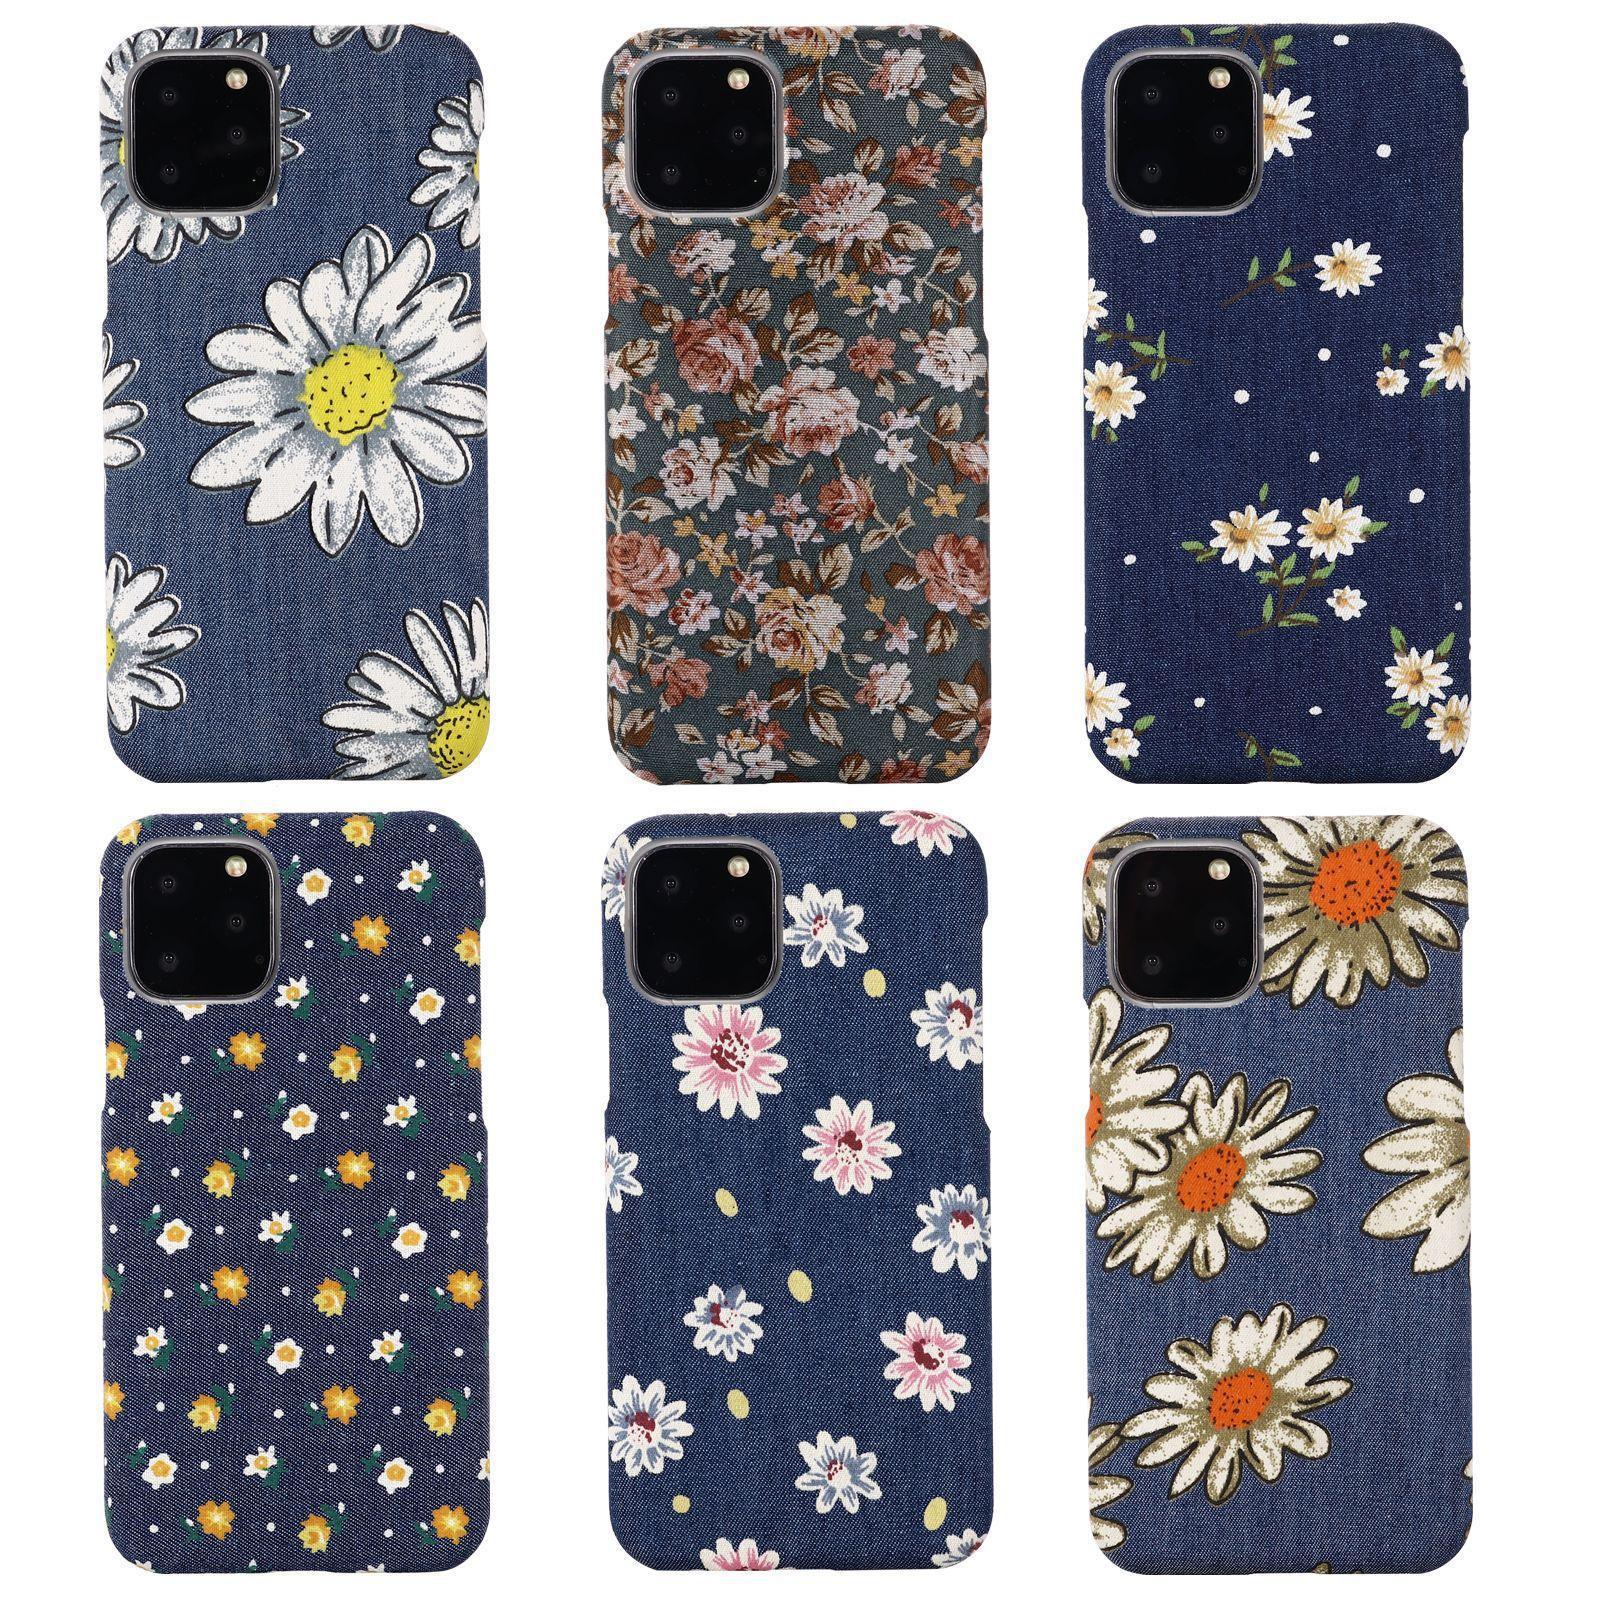 Denim Jean Chrysanthemum Printing Floral Back Cover Phone Case for iPhone 12 Mini 11 Pro Max XR XS 7 8 Plus Samsung